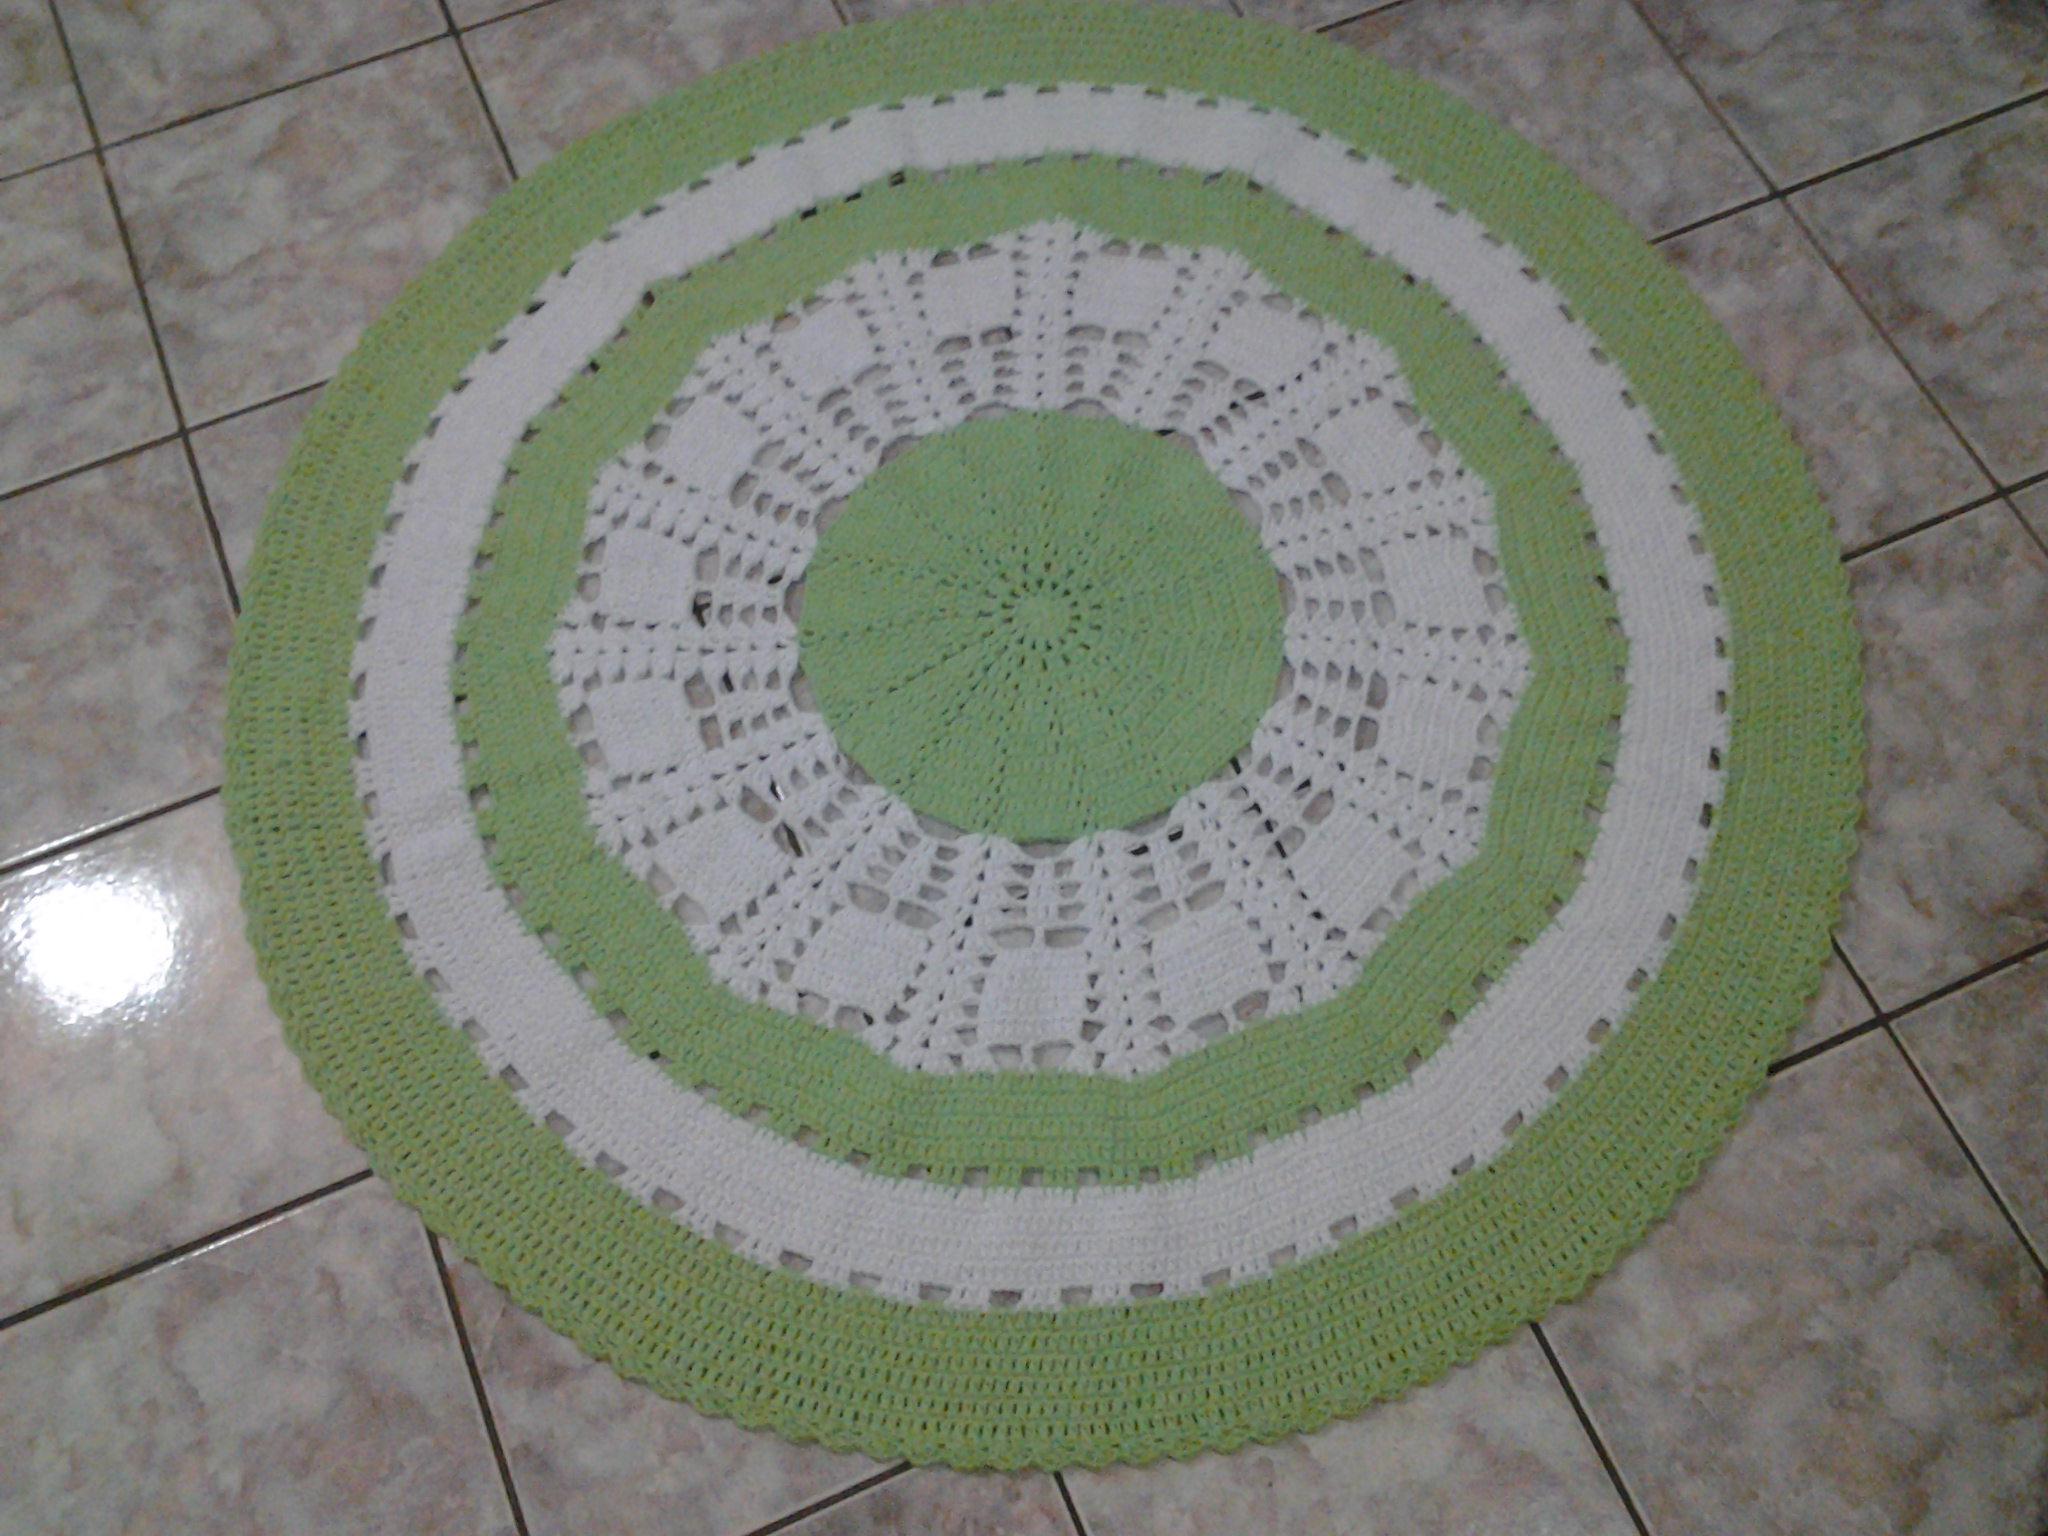 Tapete Redondo De 1 20 Mt No Elo7 Kapricho Artes Crocheteria Da